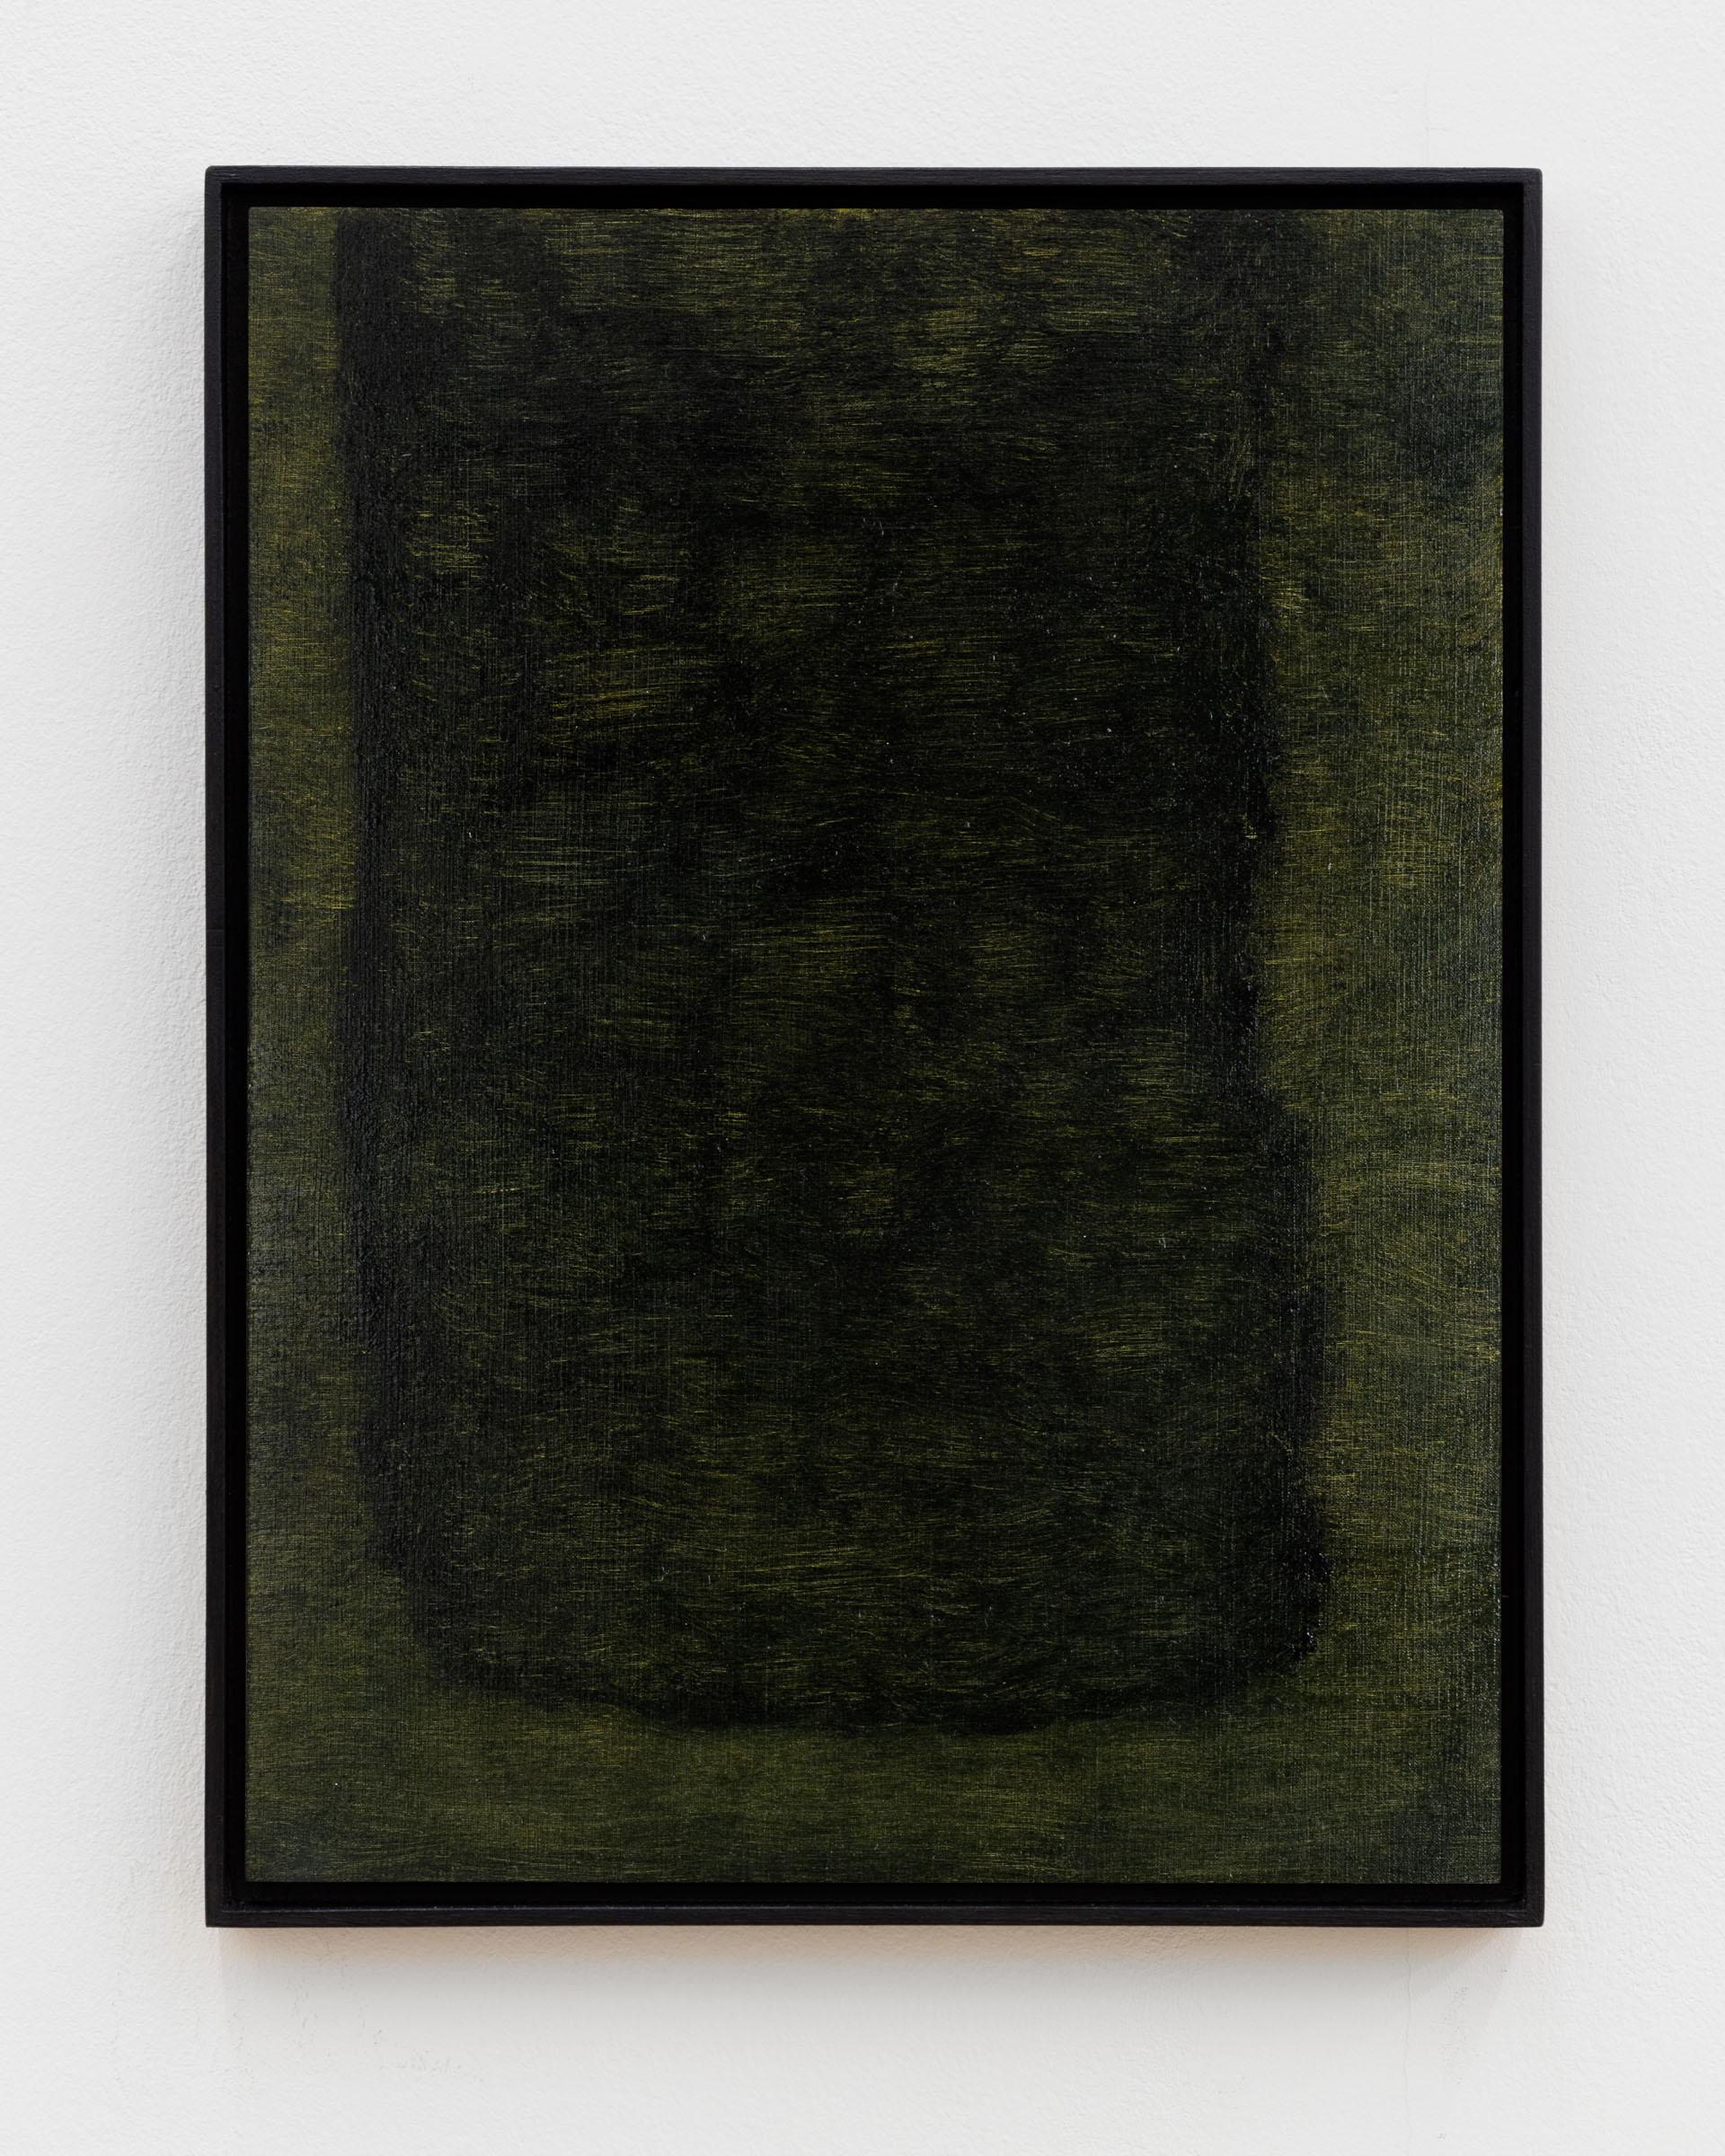 Veronika Hilger: Untitled, 2018, oil on paper on MDF in artists frame, 39,8 x 29,8 cm